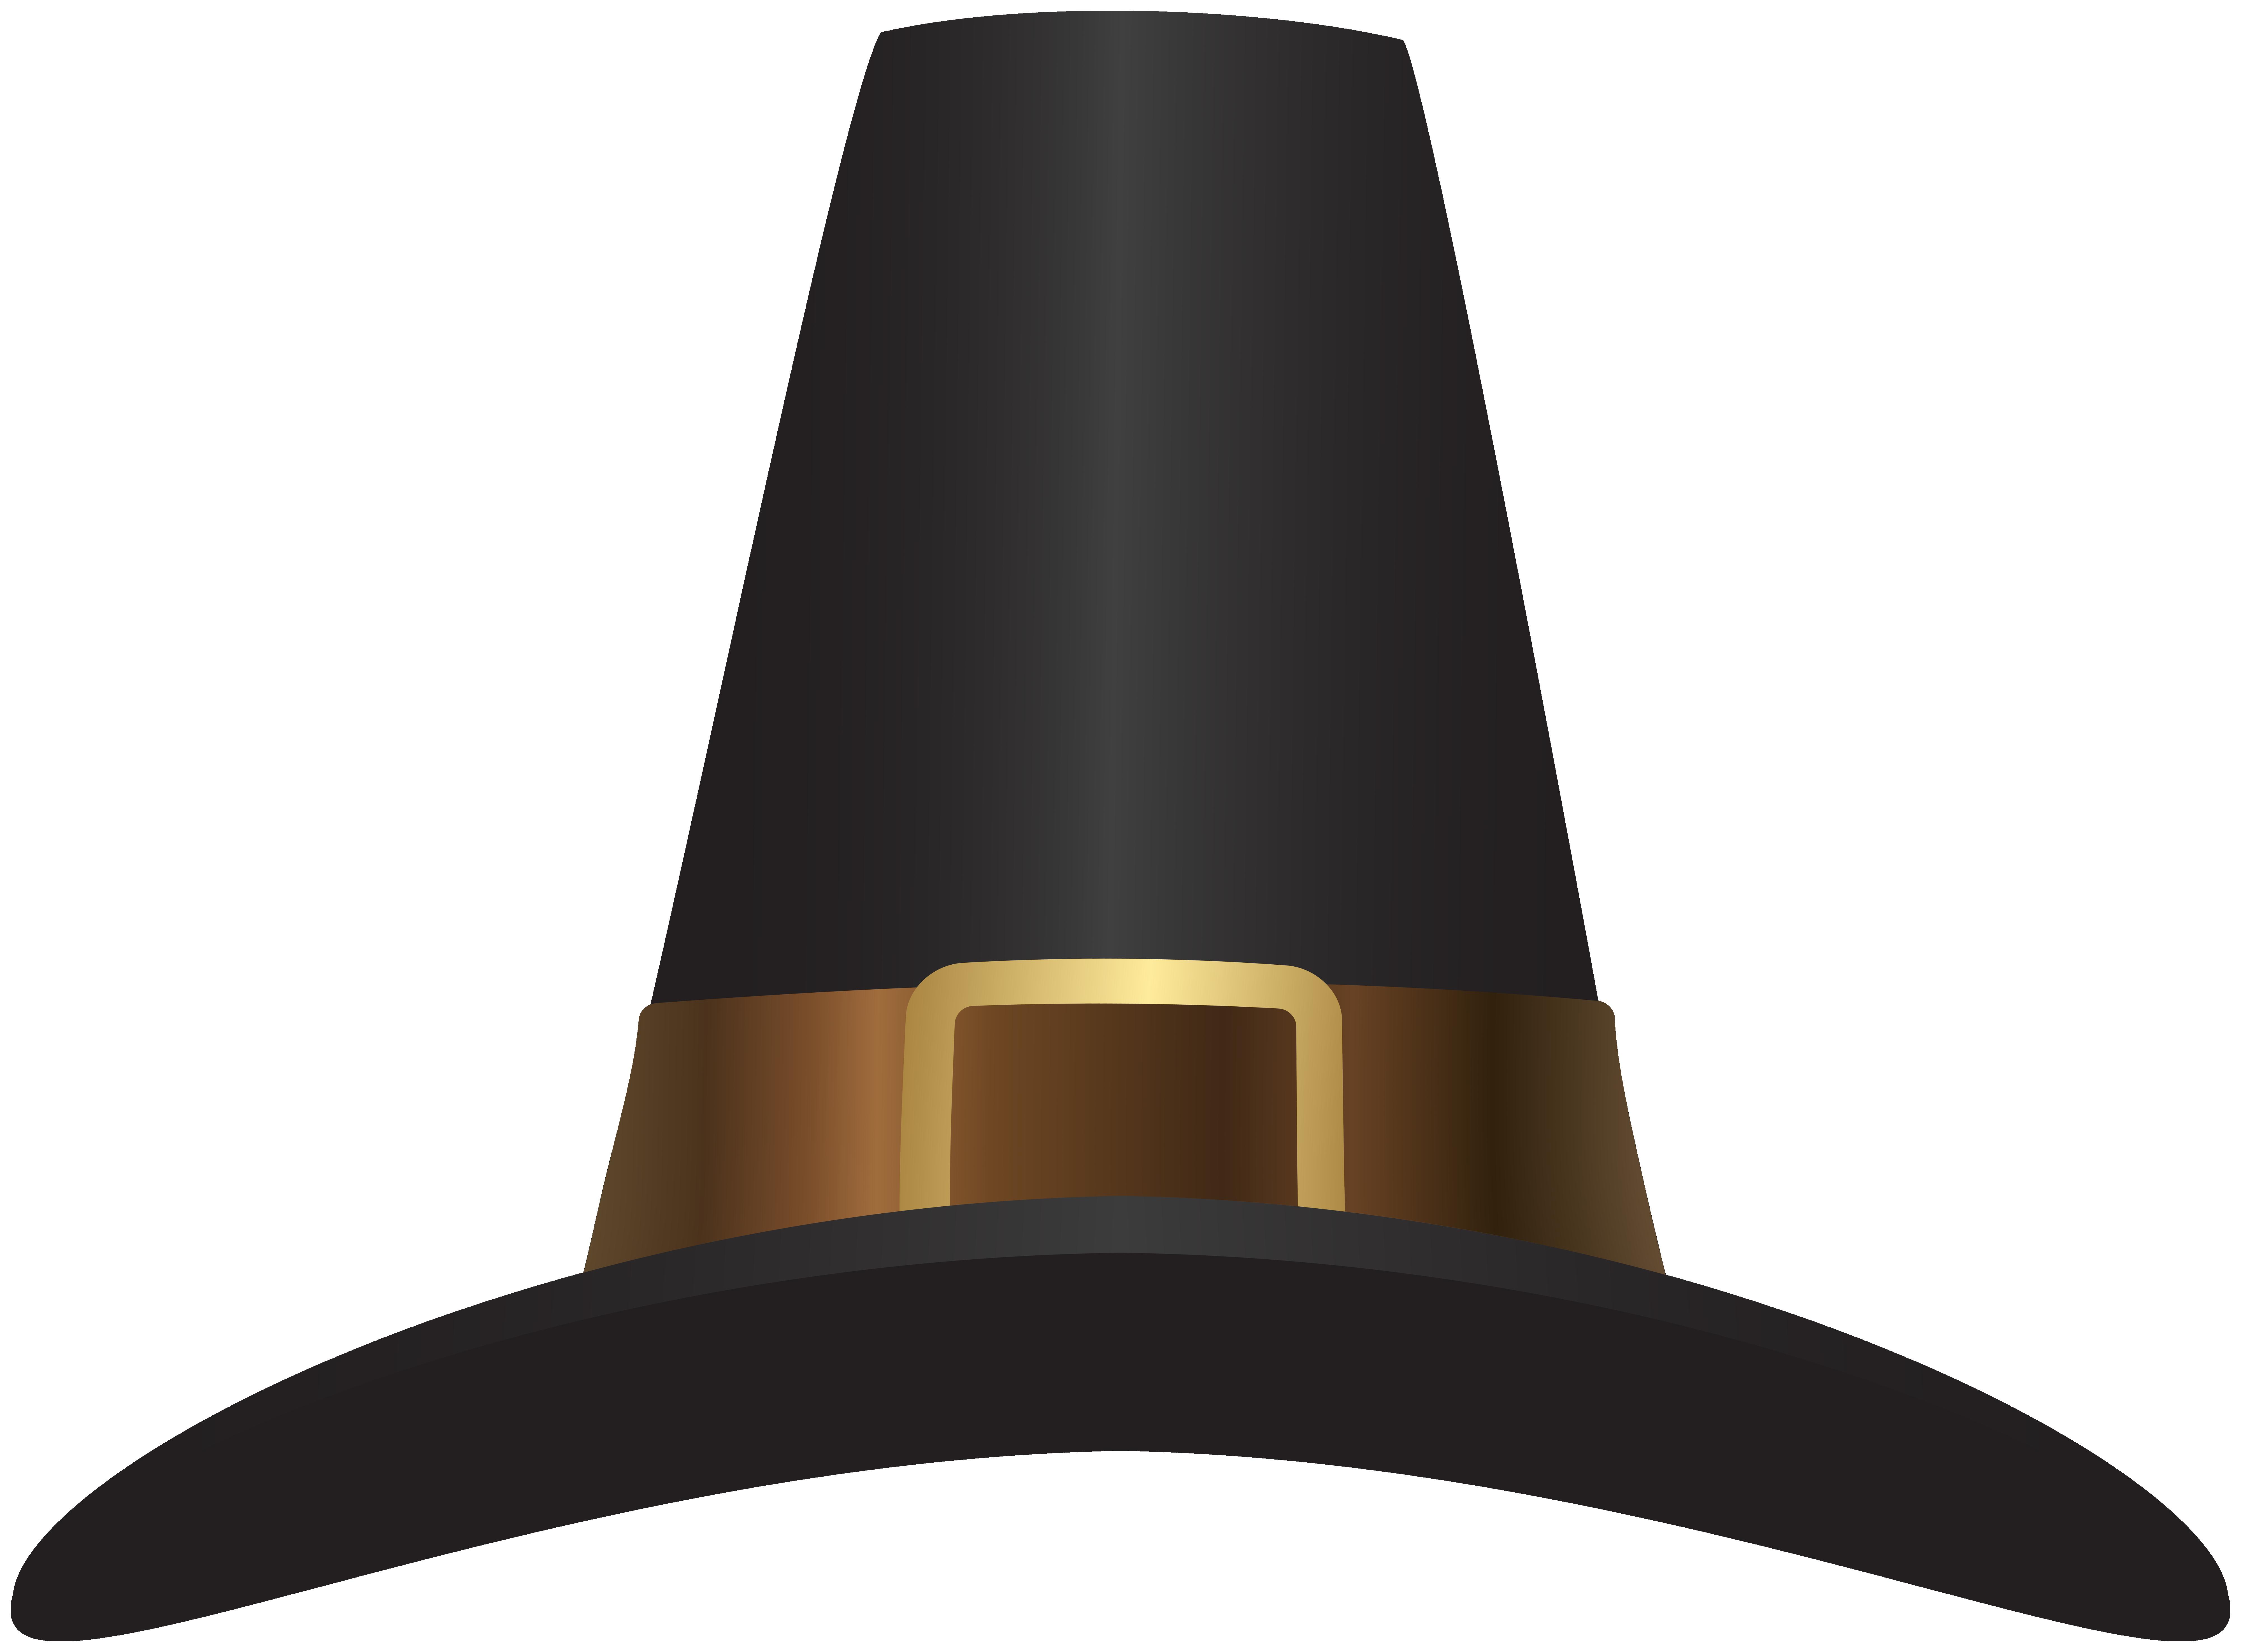 Pilgrim Hat Clip Art PNG Image.